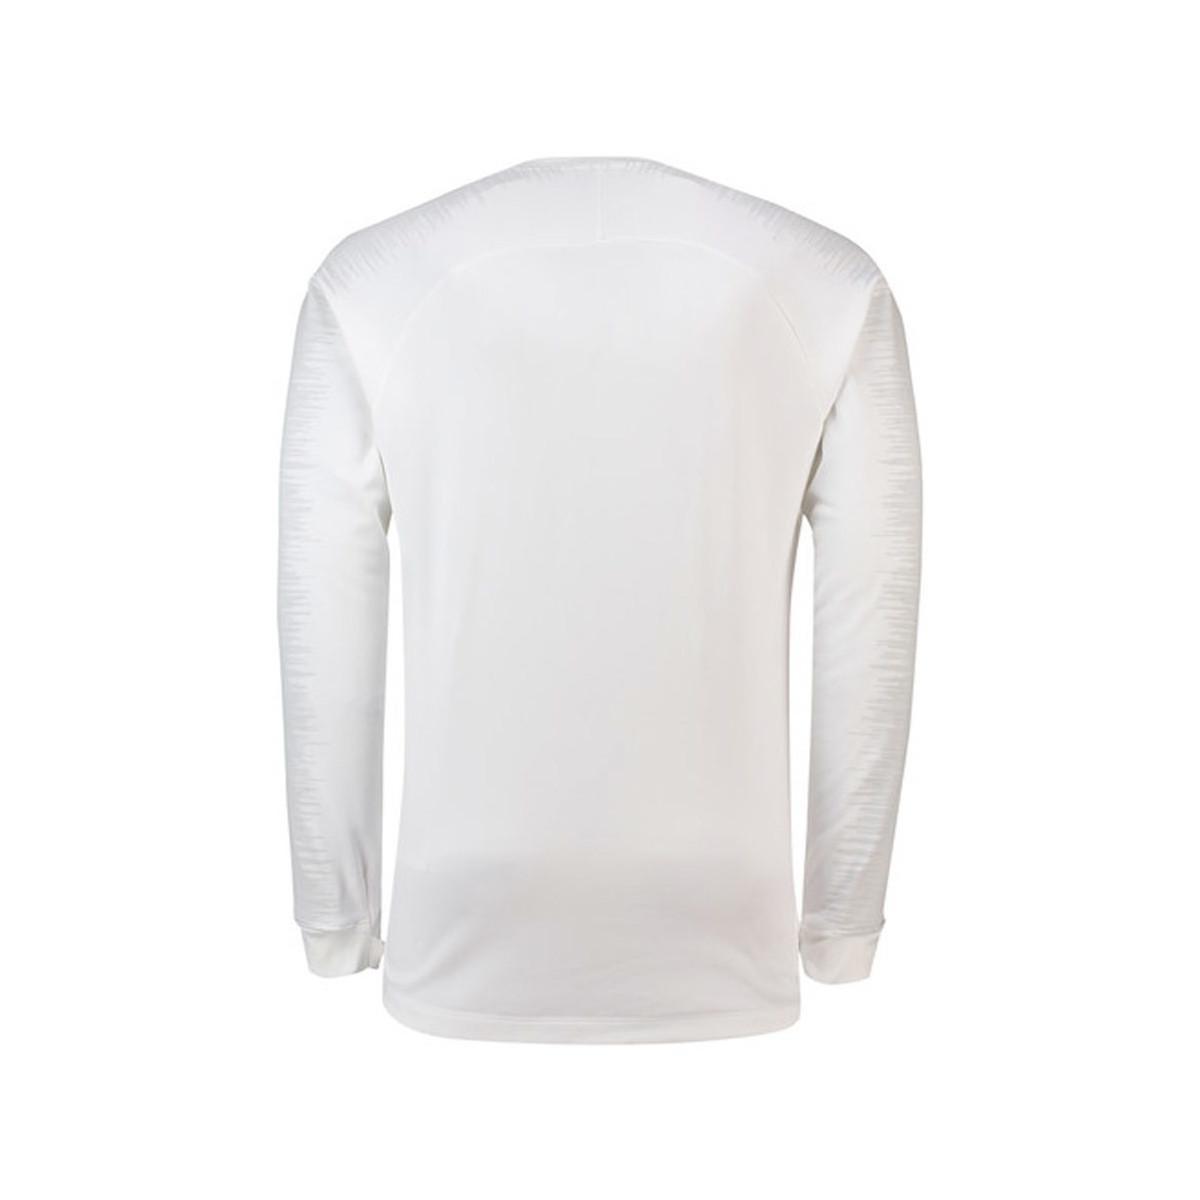 8e9ab845b85b Nike 2018-2019 England Anthem Jacket Women s Sweatshirt In White in ...